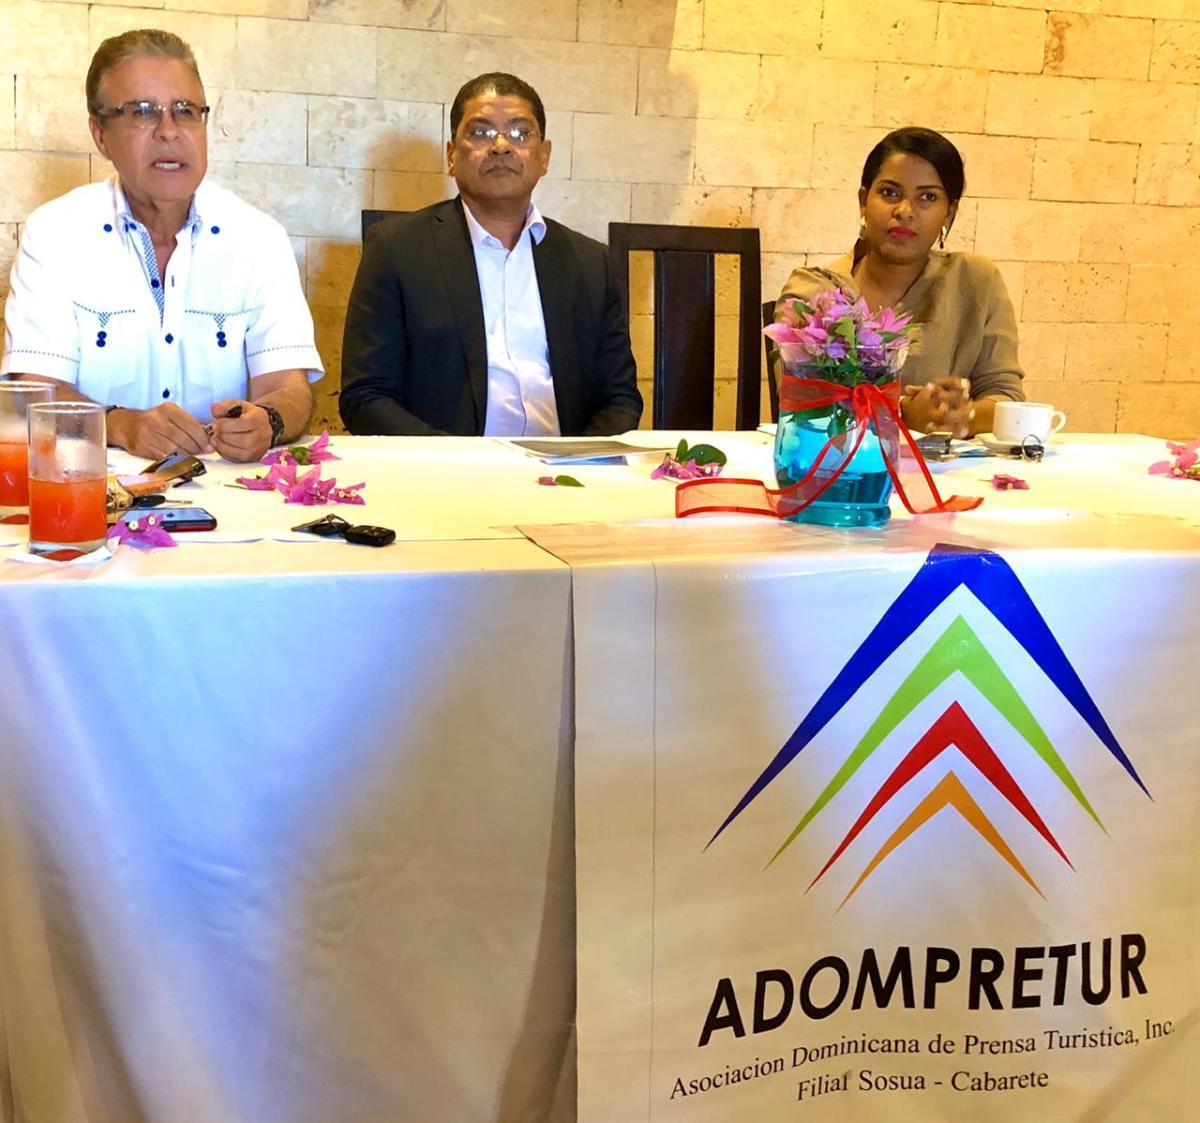 ADOMPRETUR Sosúa -Cabarete celebra primera Asamblea General 2020; ratificandirectiva